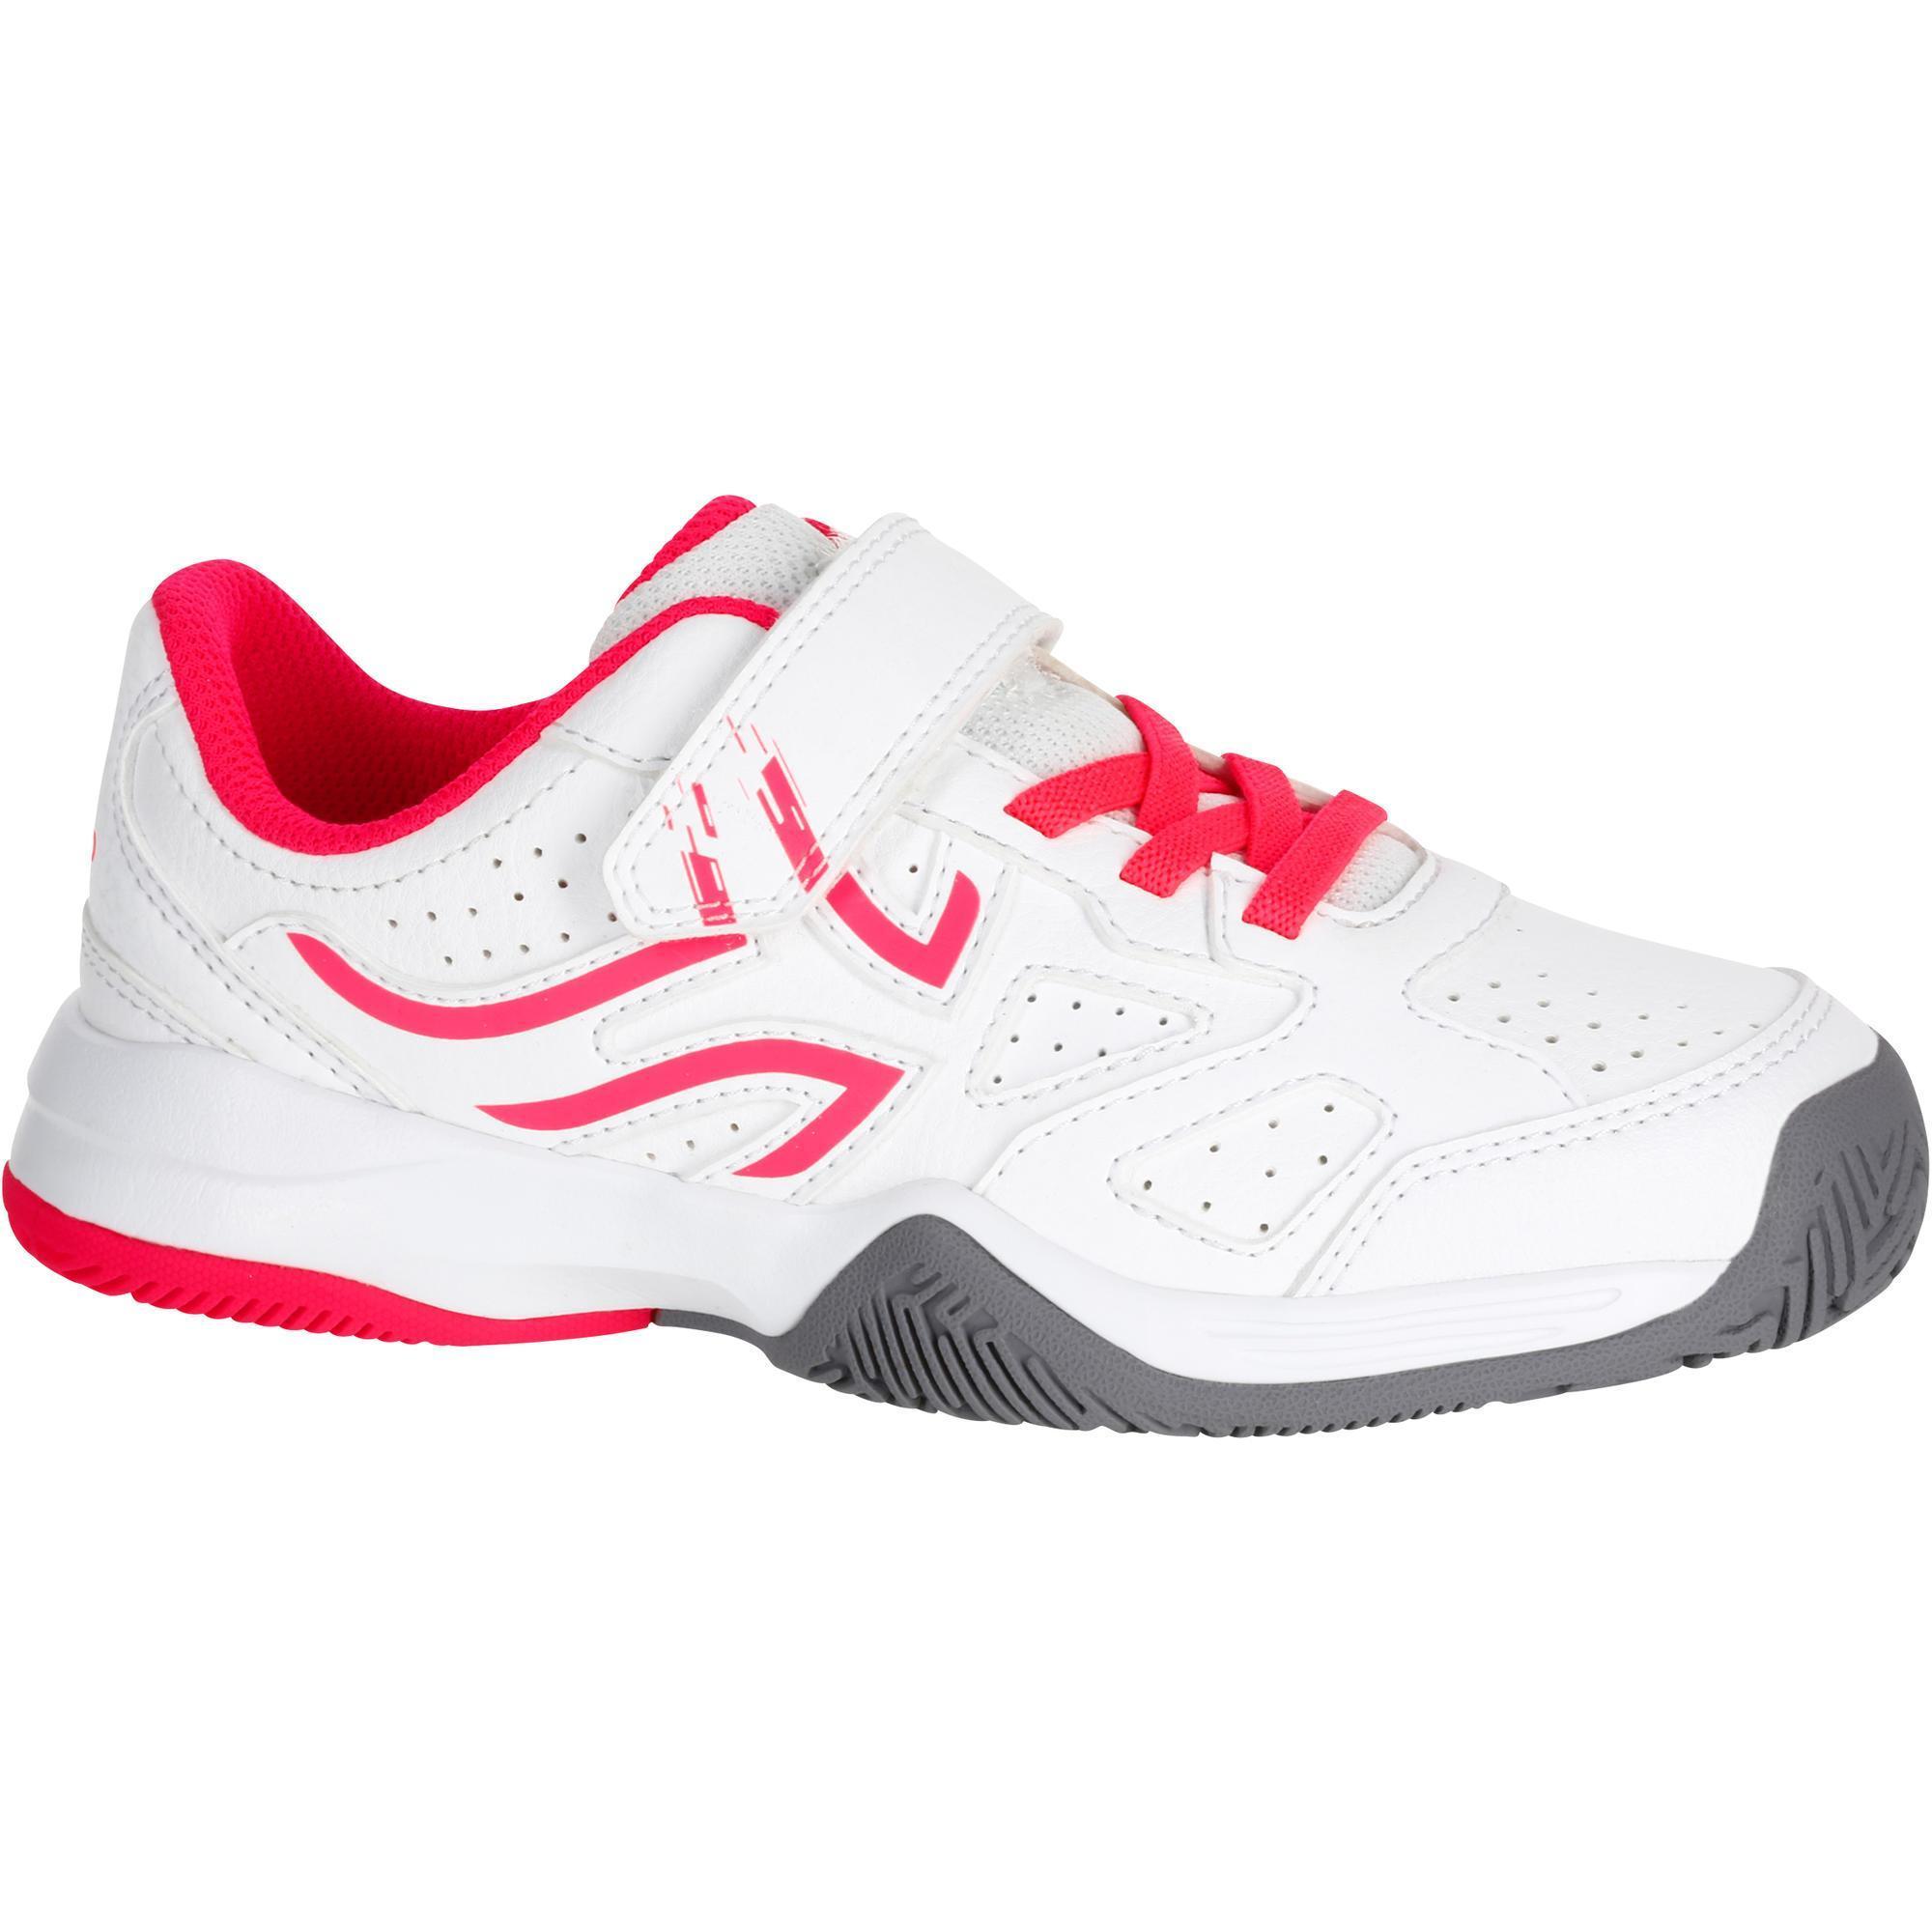 Artengo Tennisschoenen kinderen Artengo TS530 wit/roze